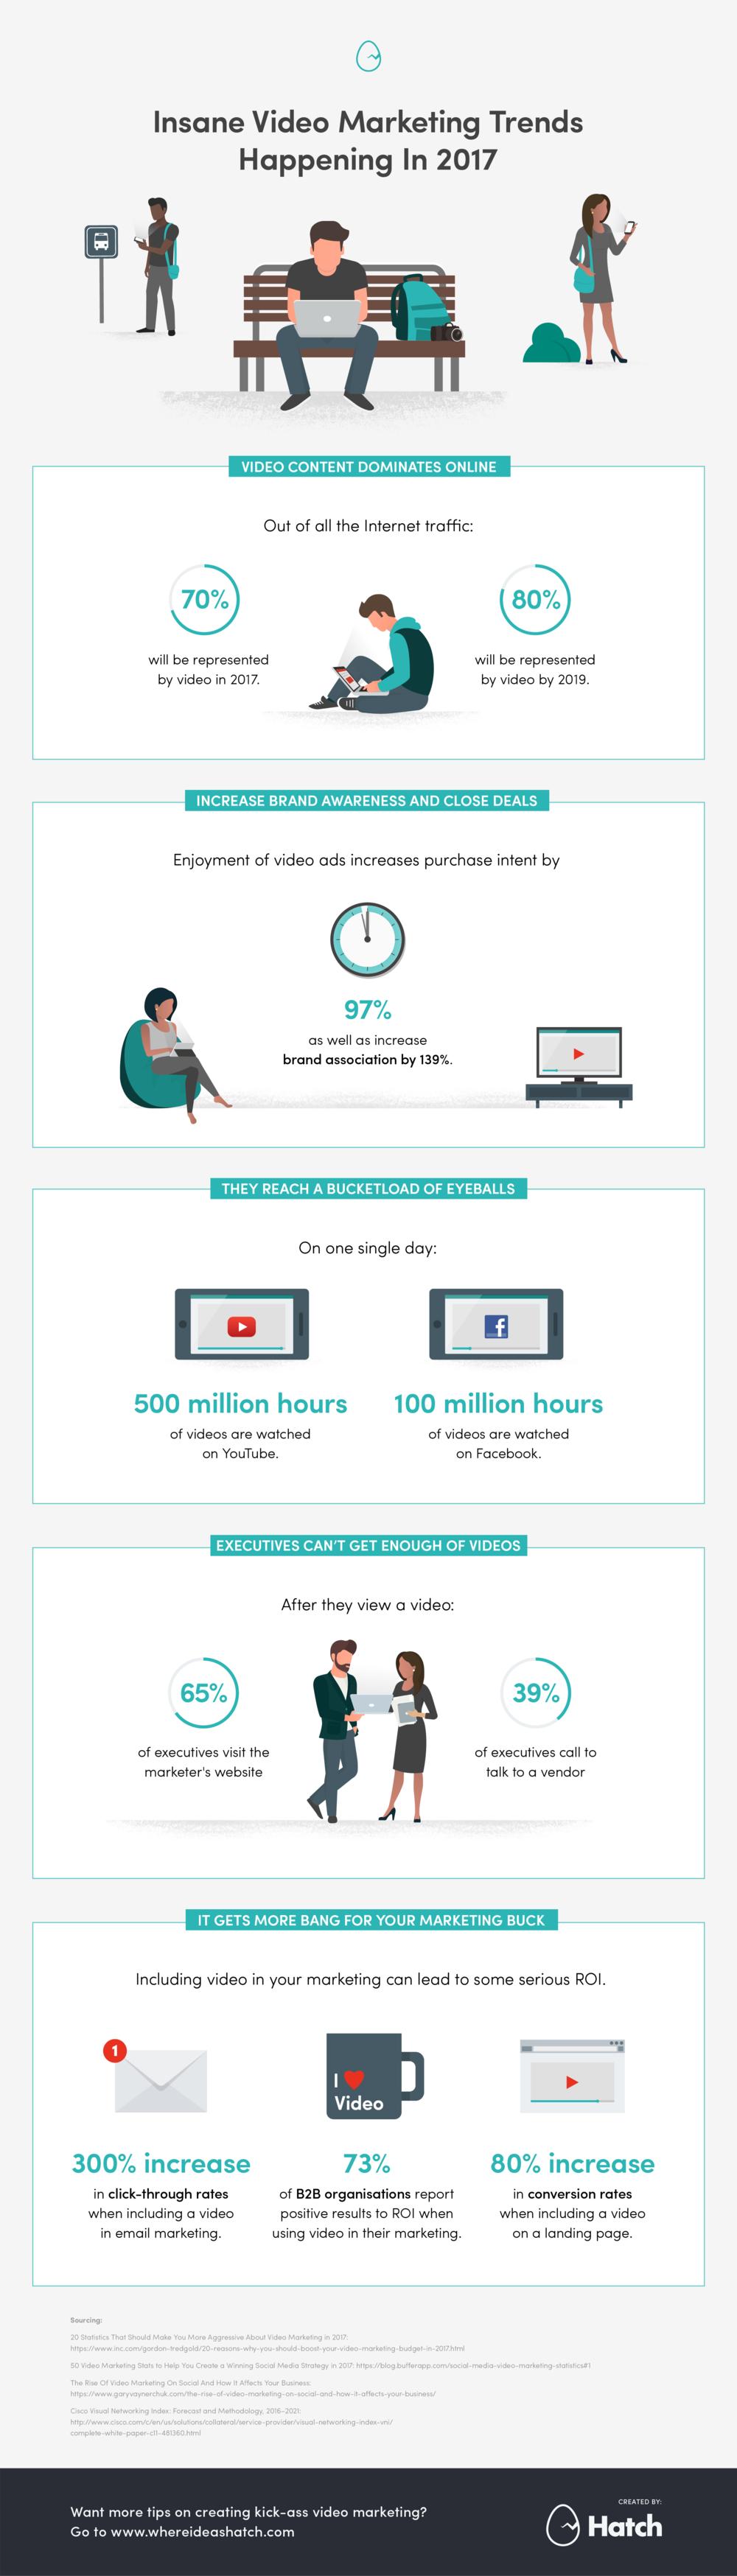 Insane Video Marketing Trends Happening in 2017